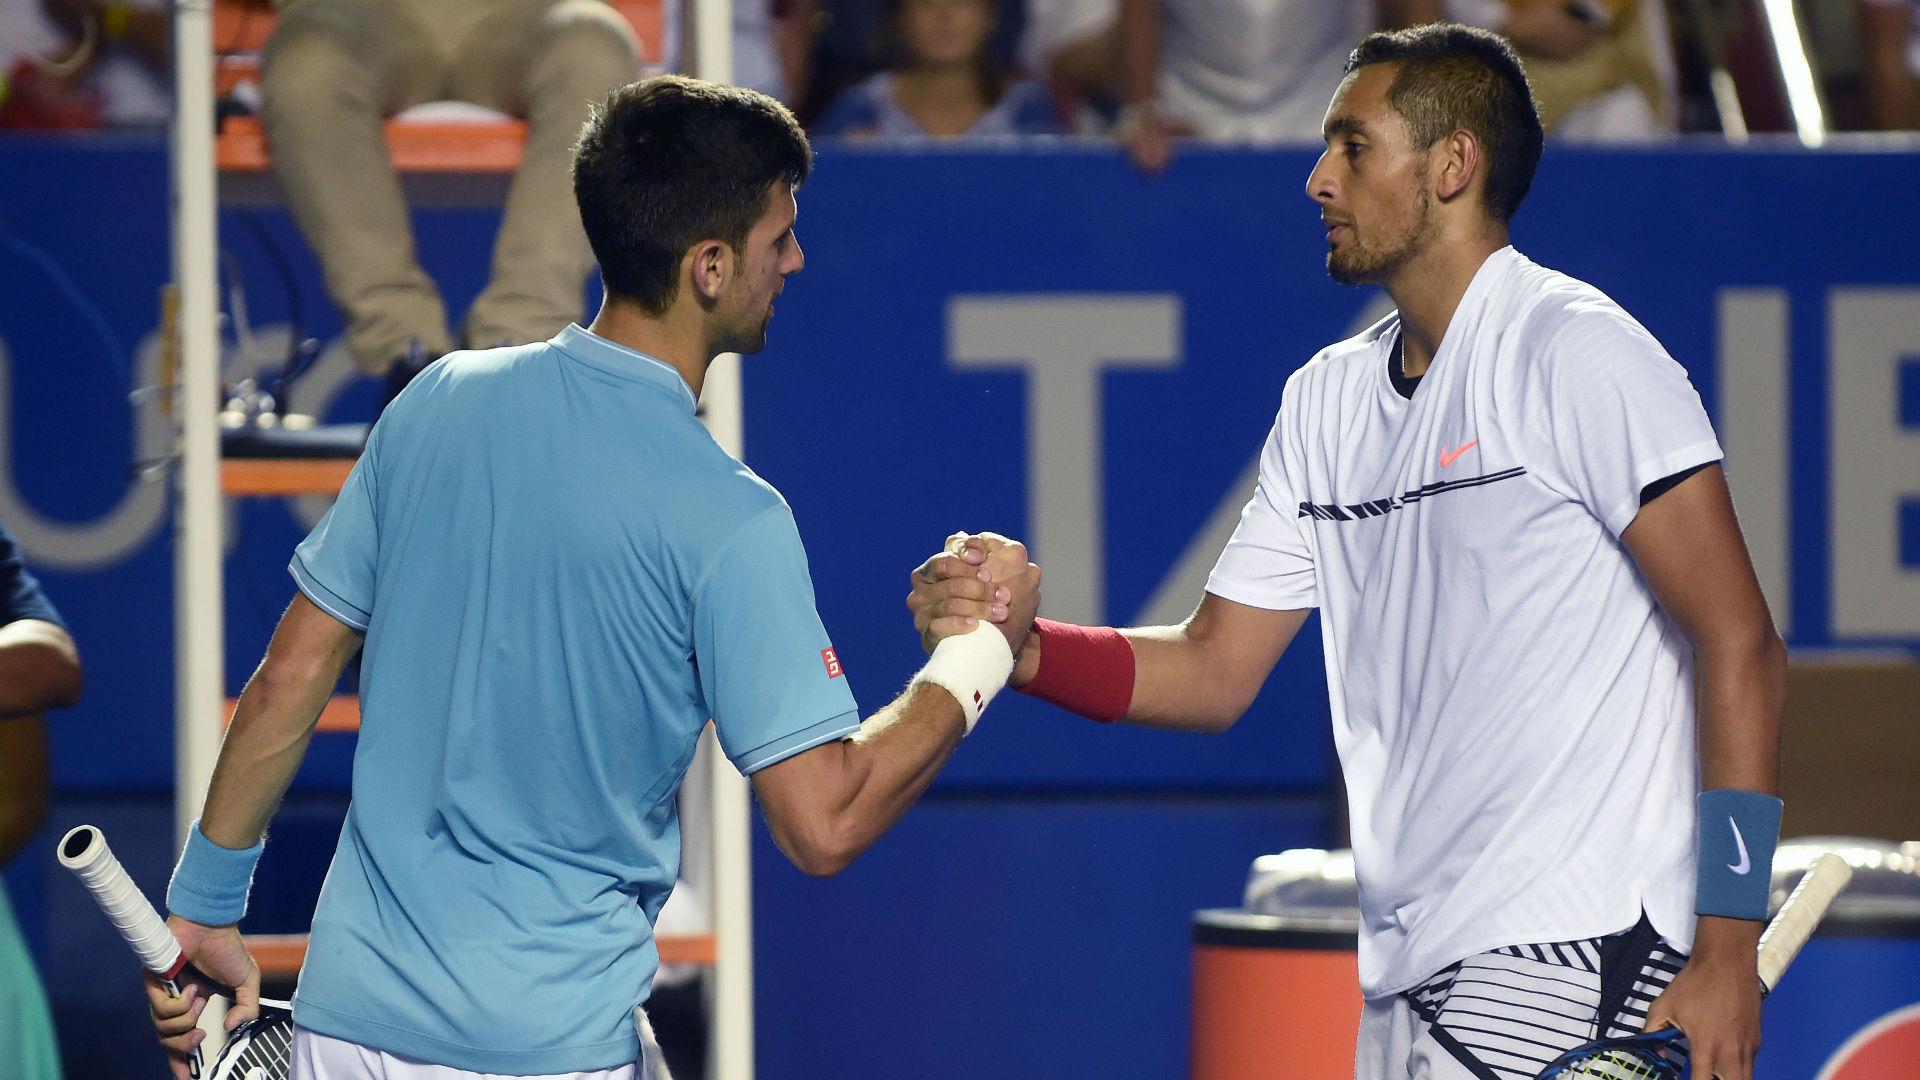 Nick Kyrgios slams 'boneheaded' Novak Djokovic-led Adria Tour event